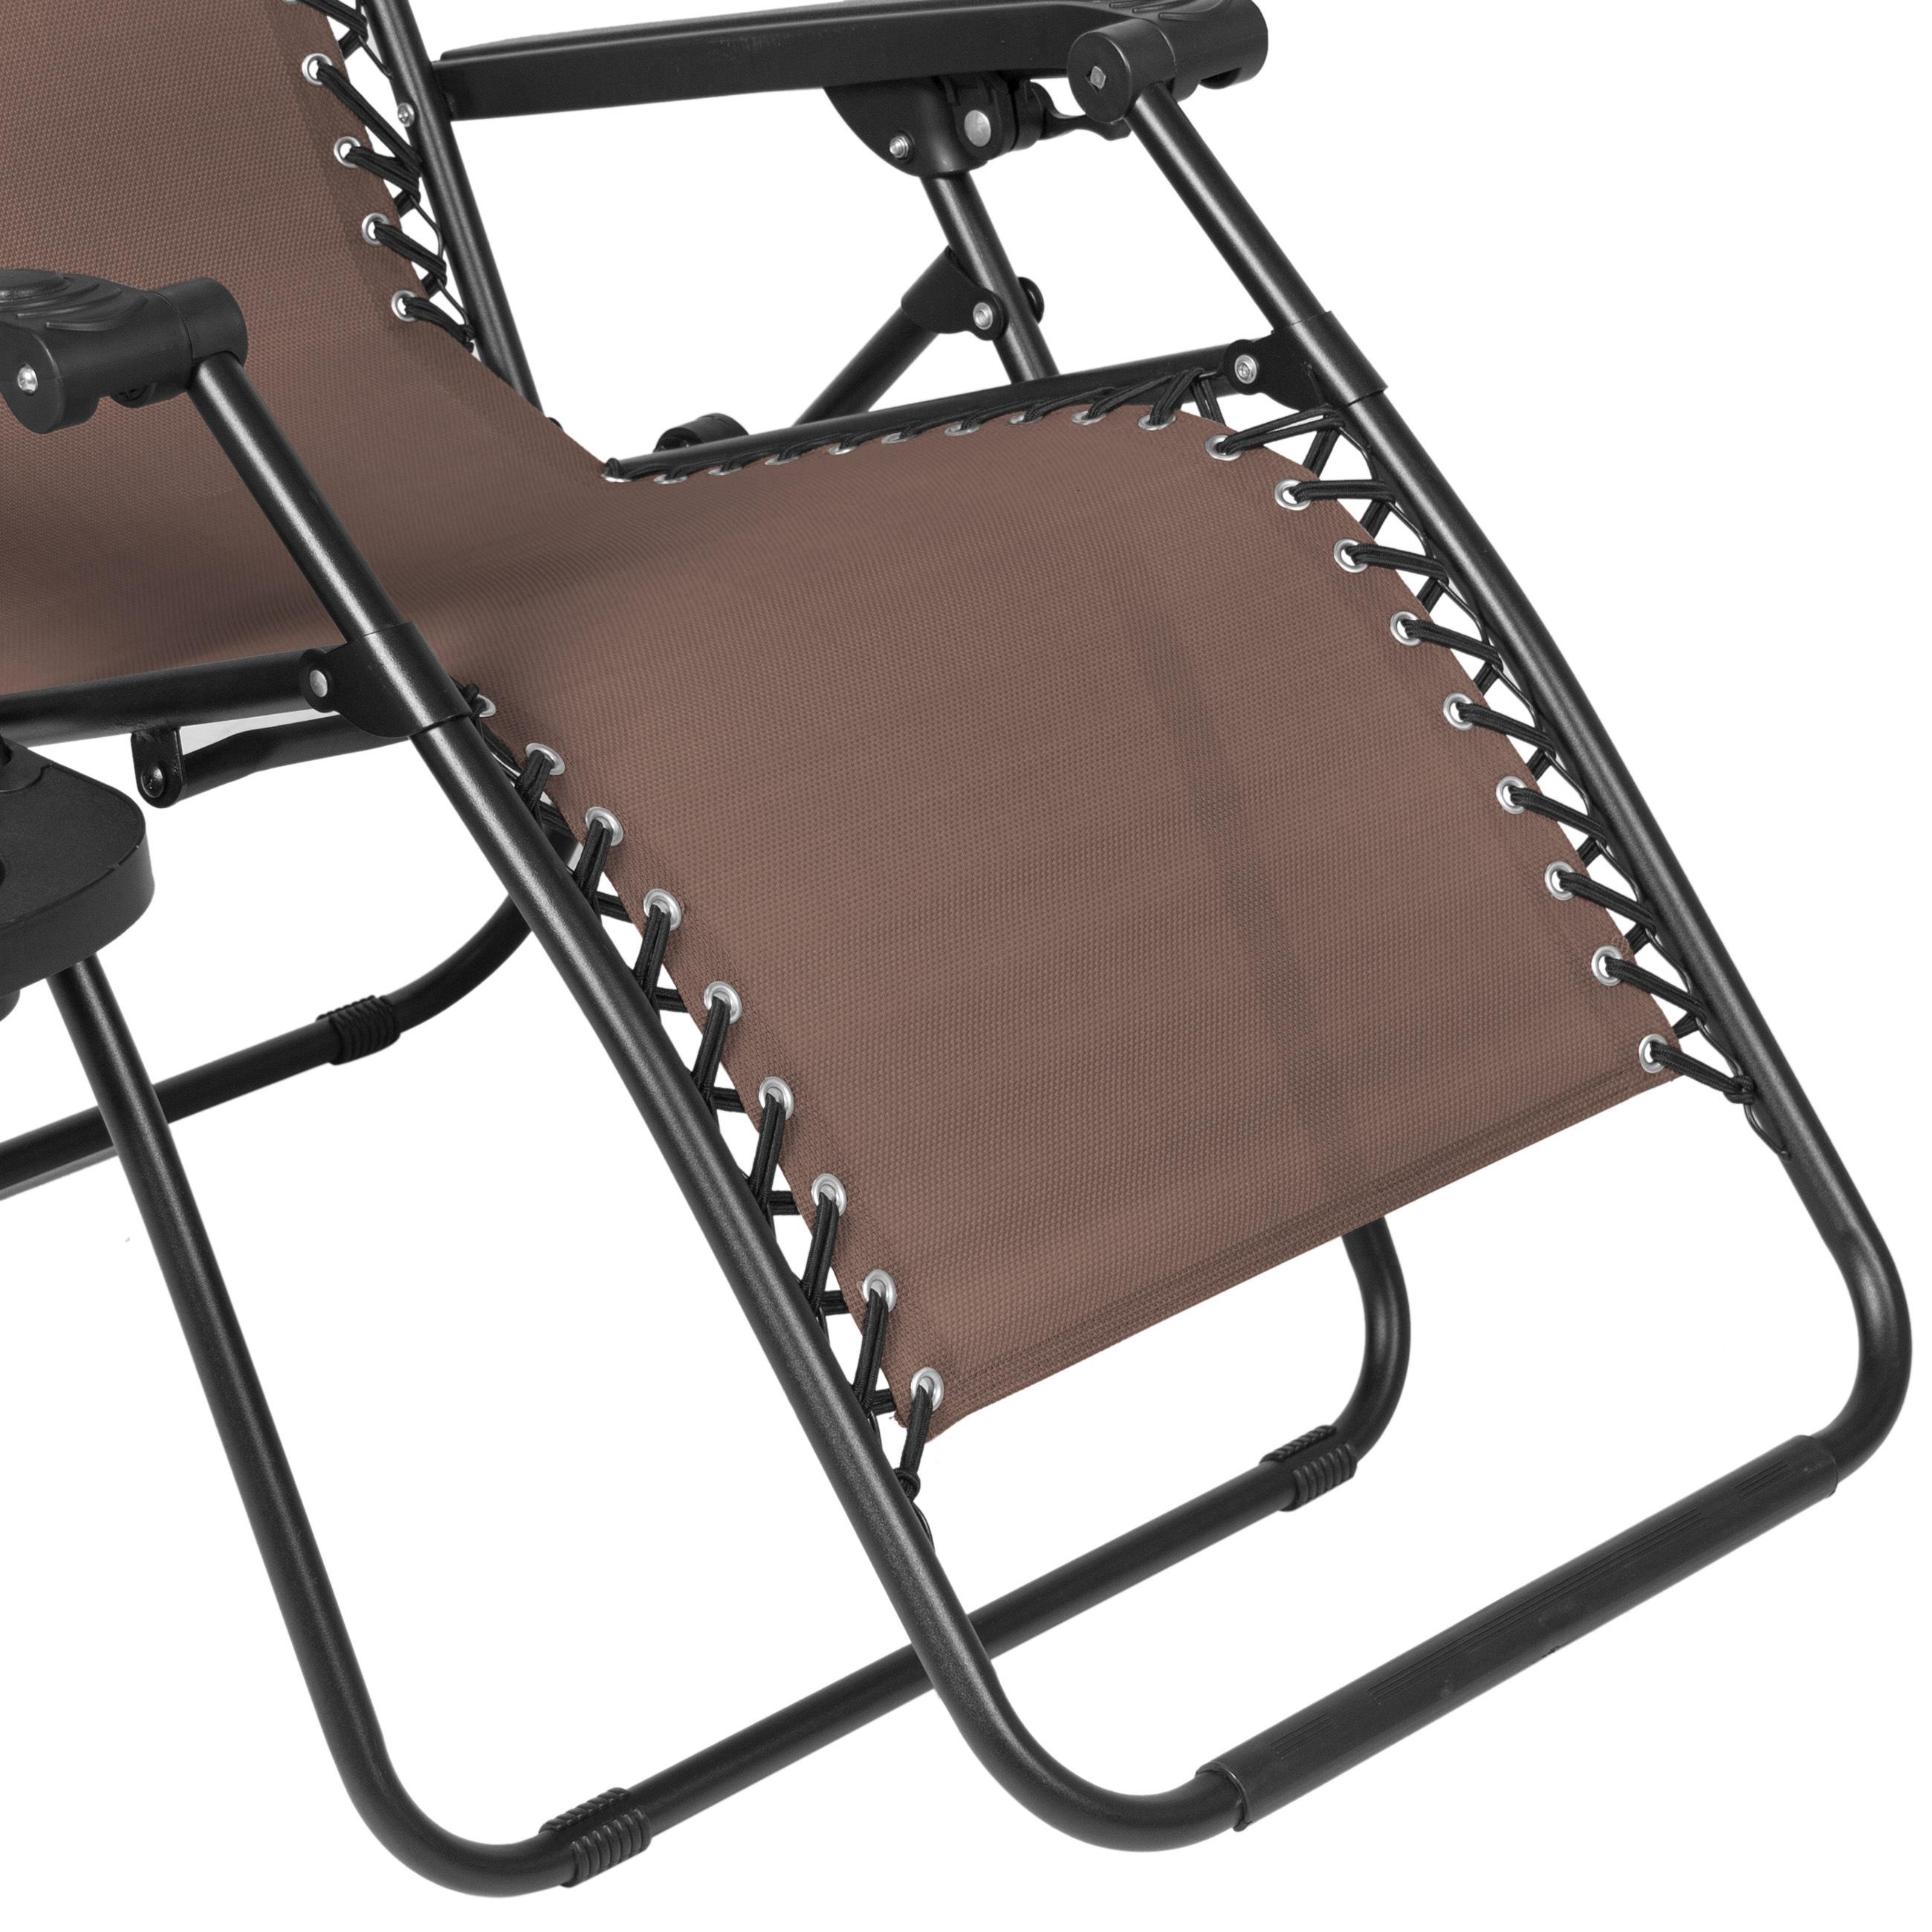 Bcp Folding Zero Gravity Recliner Lounge Chair W Canopy